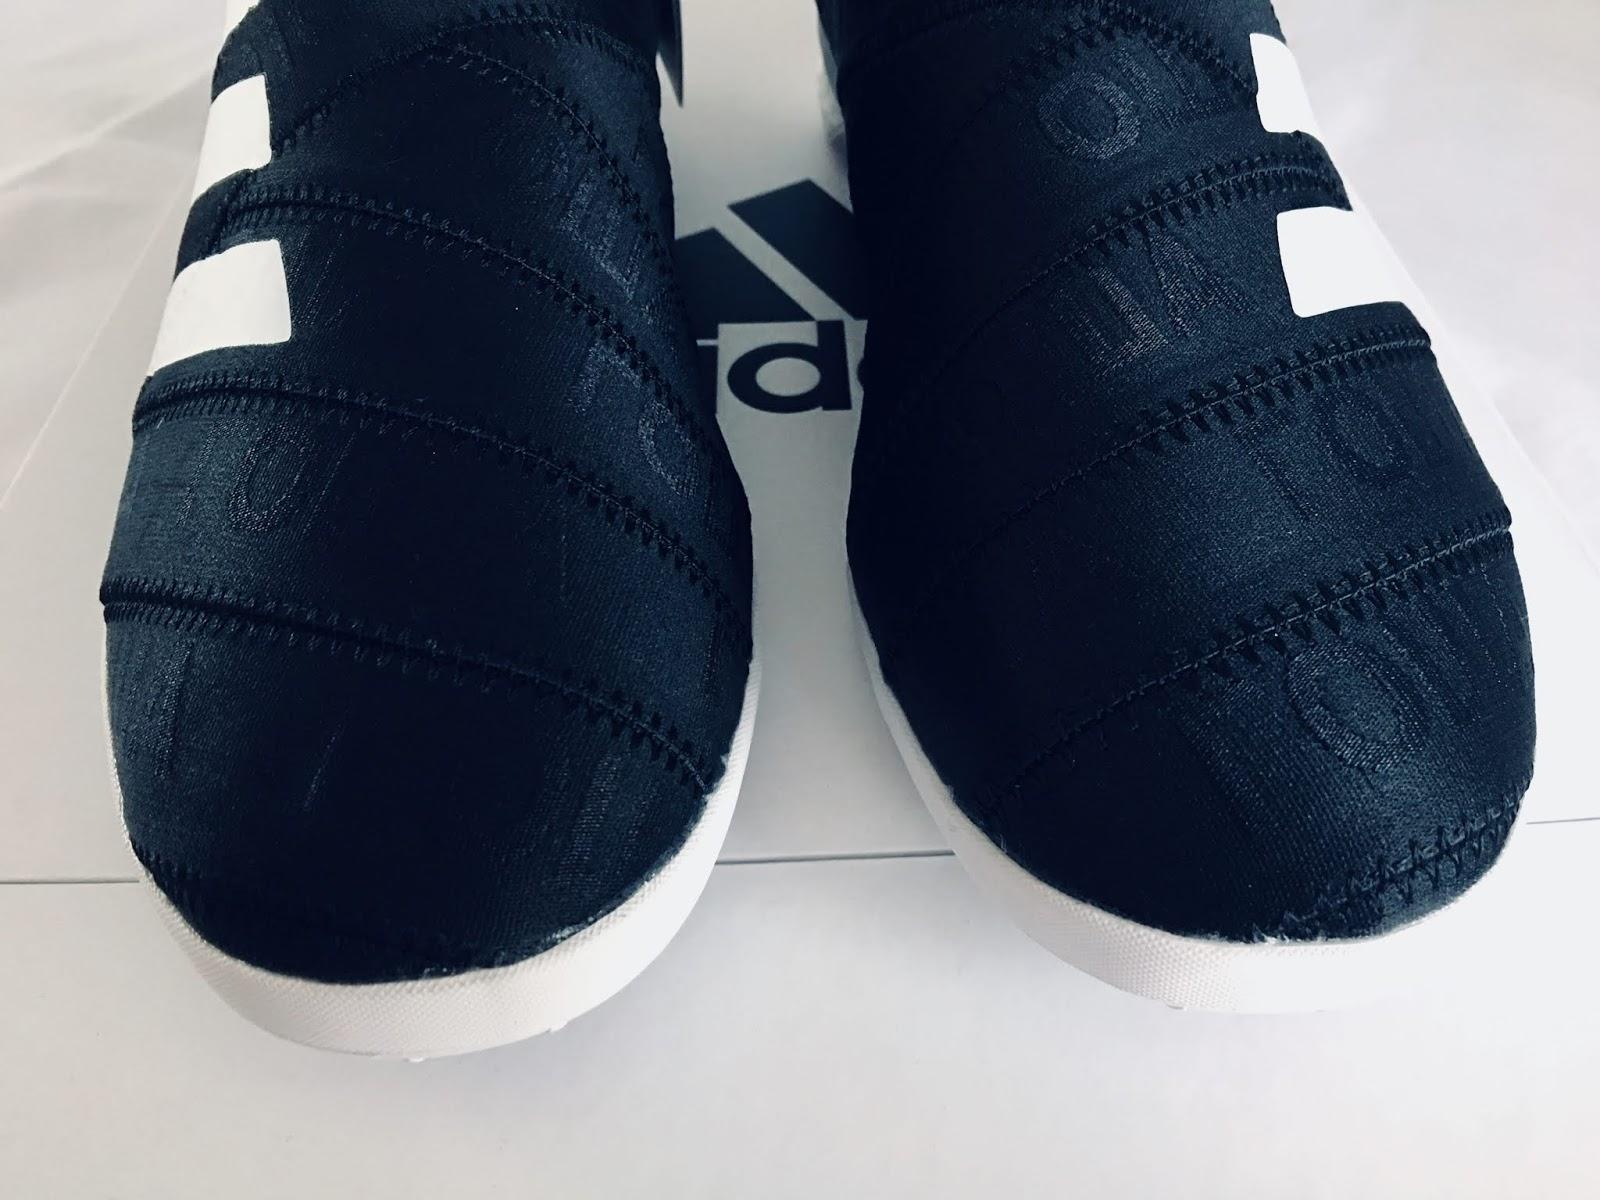 90c7cae9918e Gosha Rubchinskiy x Adidas Nemeziz Mid Sneakers